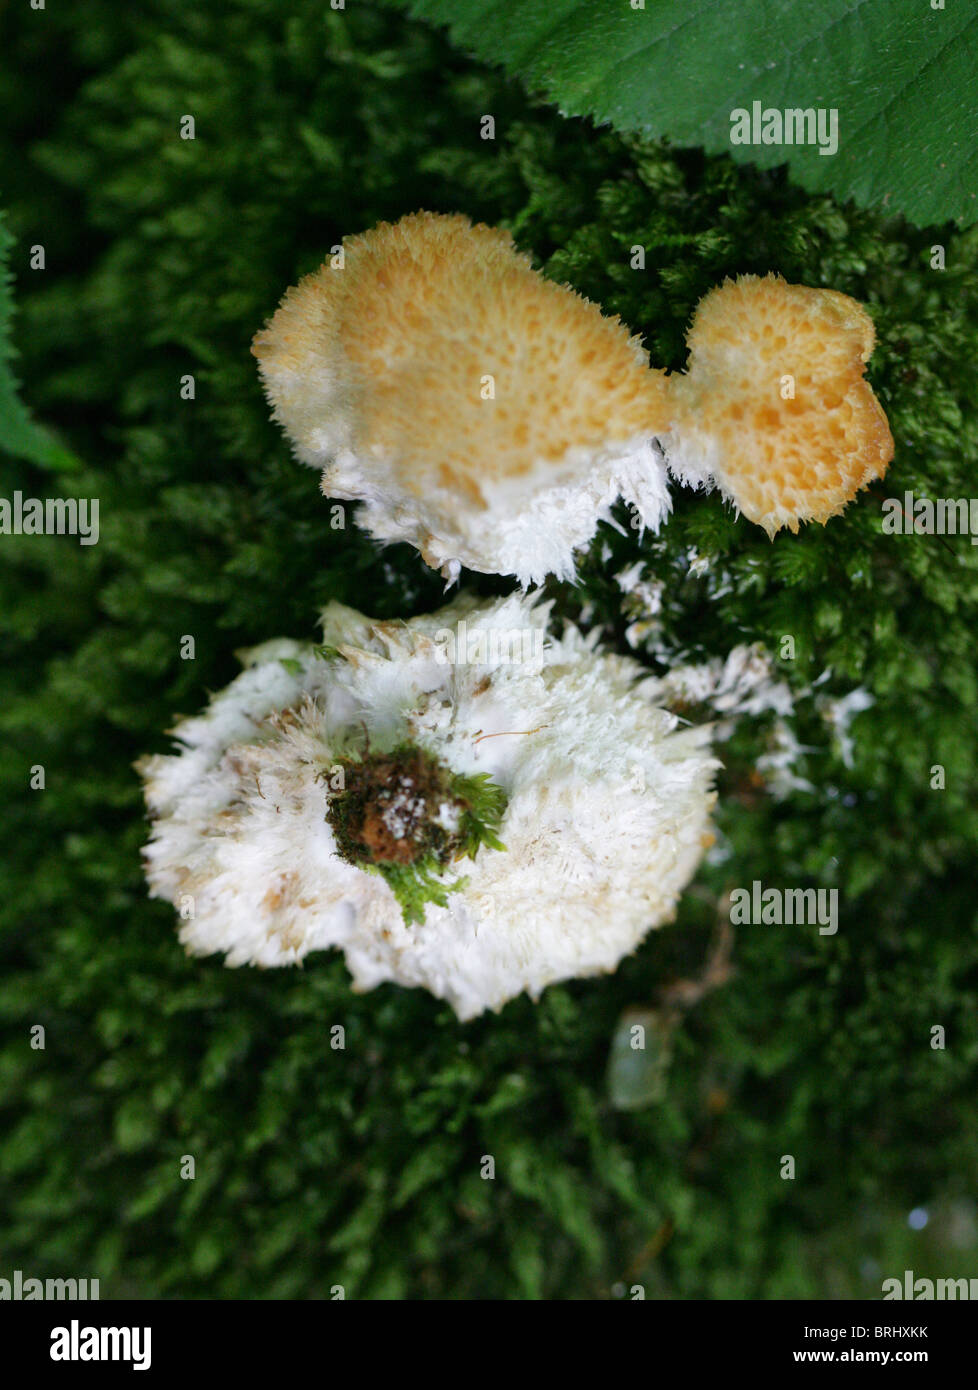 Tiered Tooth Fungus, Hericium cirrhatum, Hericiaceae. Growing on Mossy Tree Stump. - Stock Image